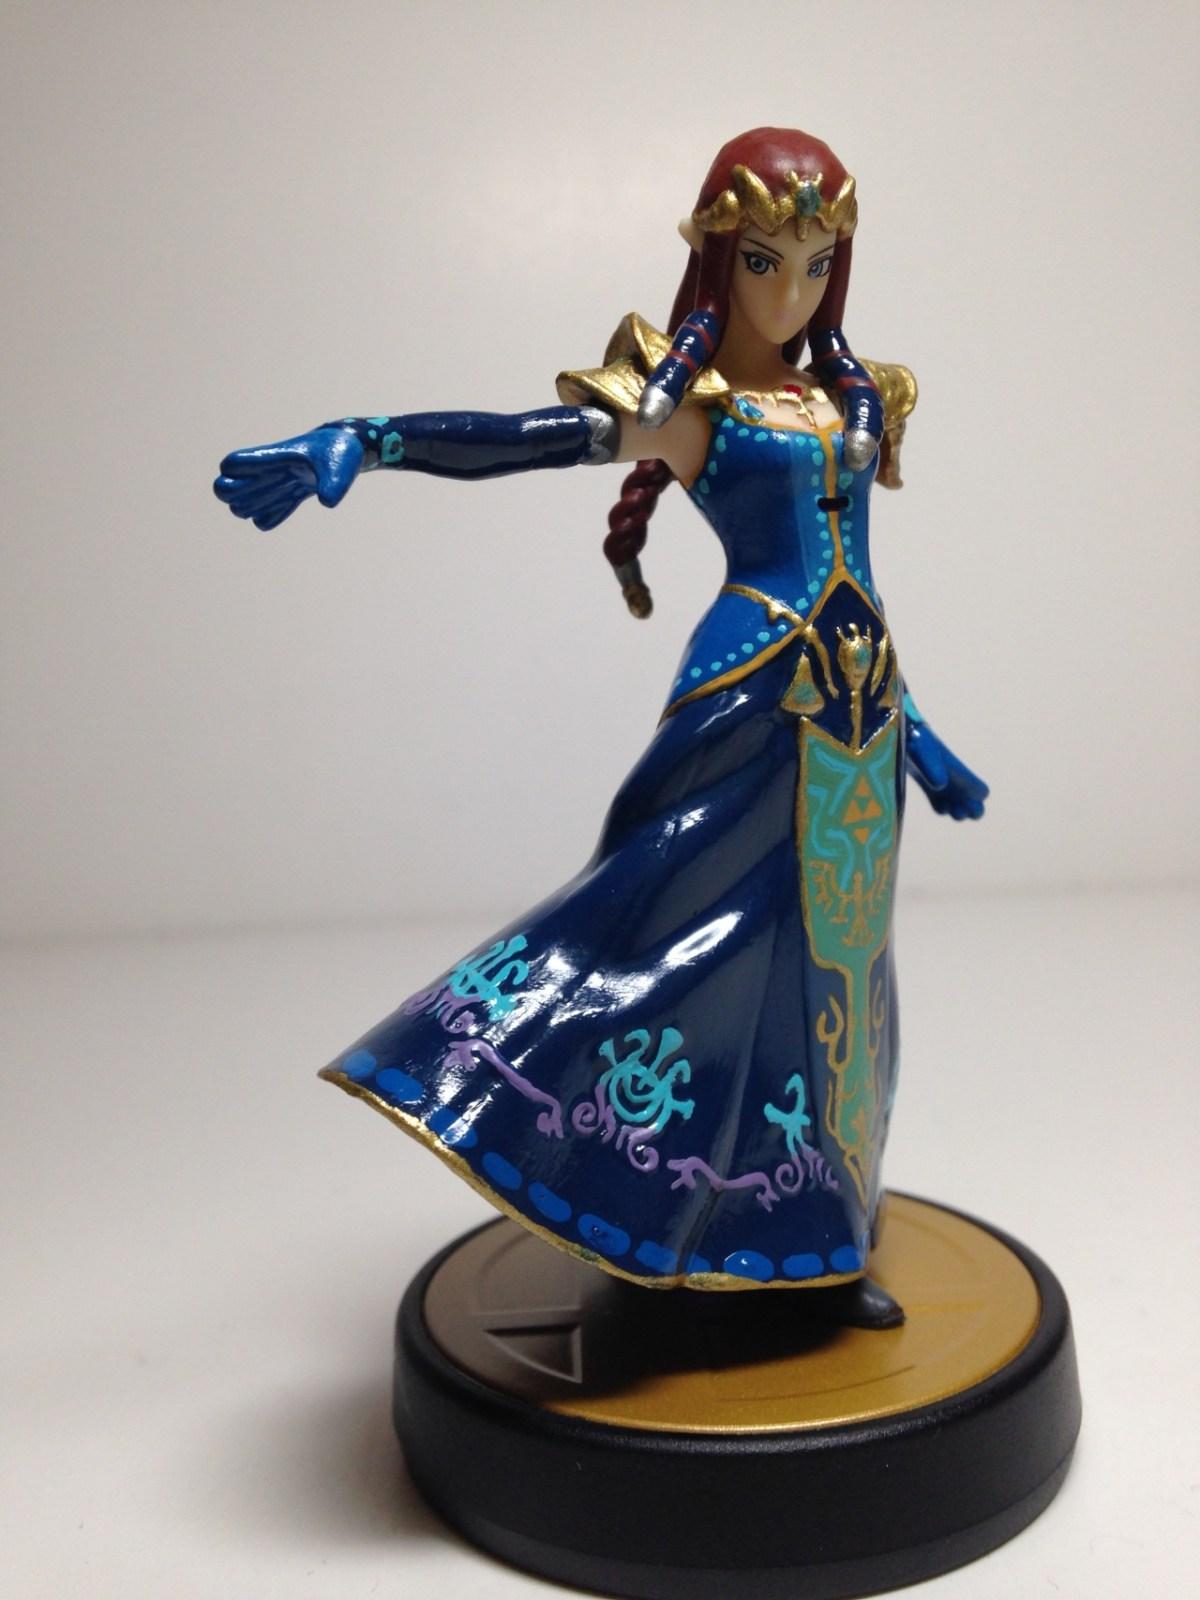 Zelda Repaint by Omikujii